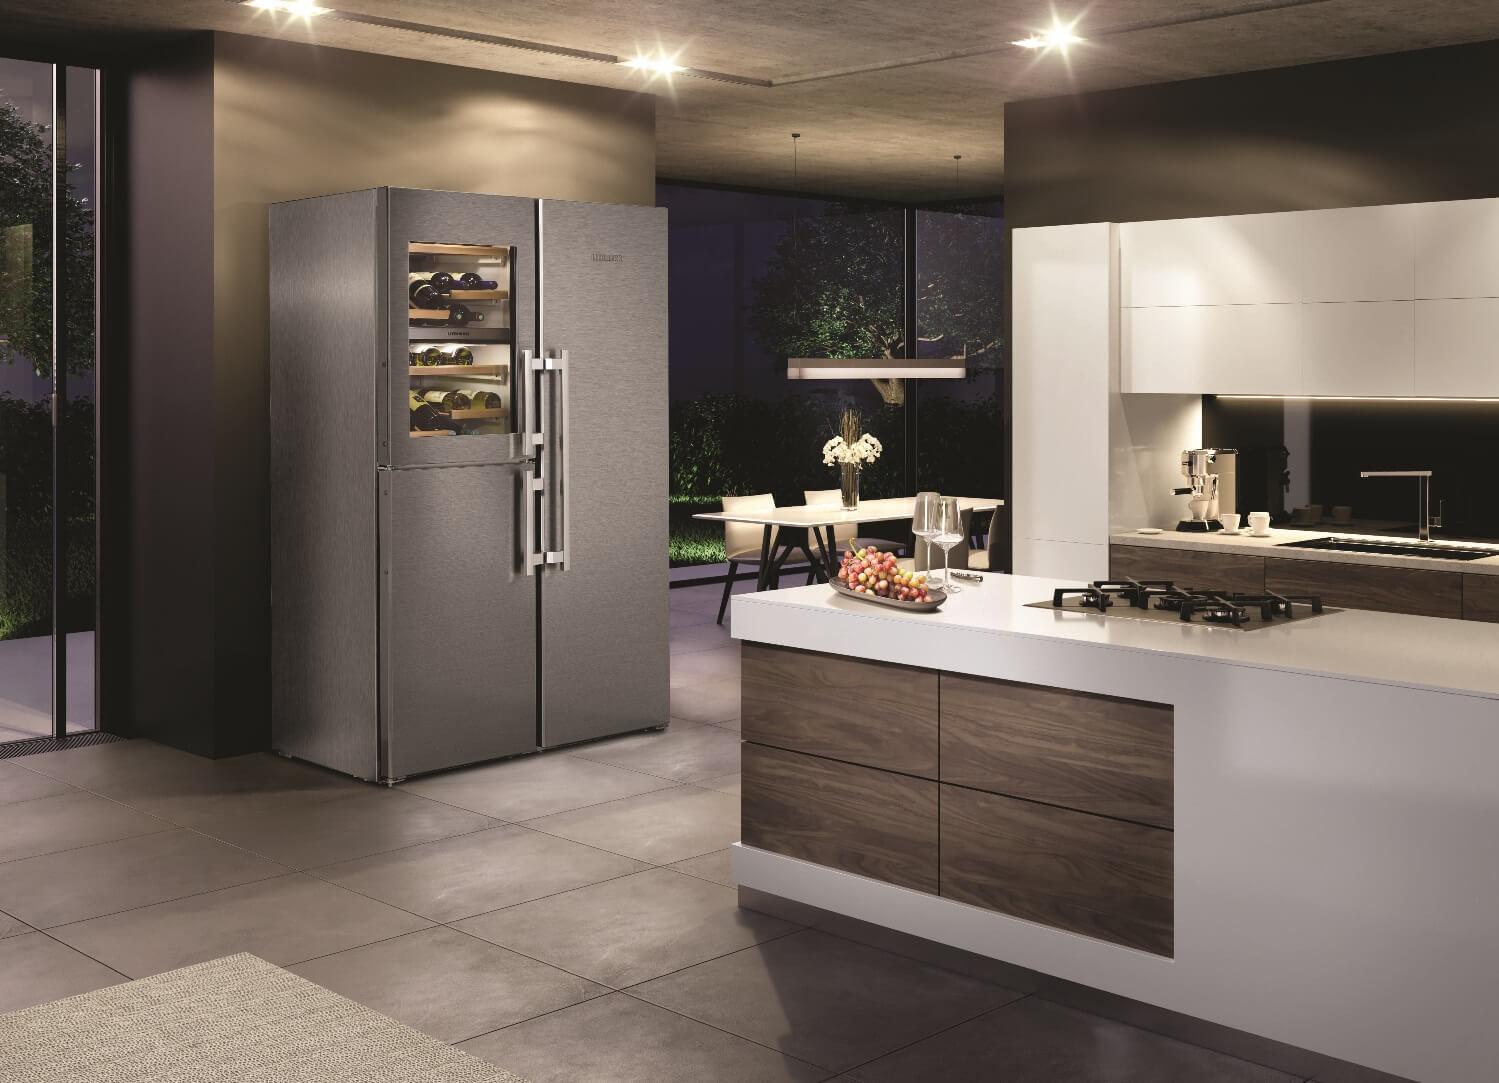 купить Side-by-Side холодильник Liebherr SBSes 8486 Украина фото 7